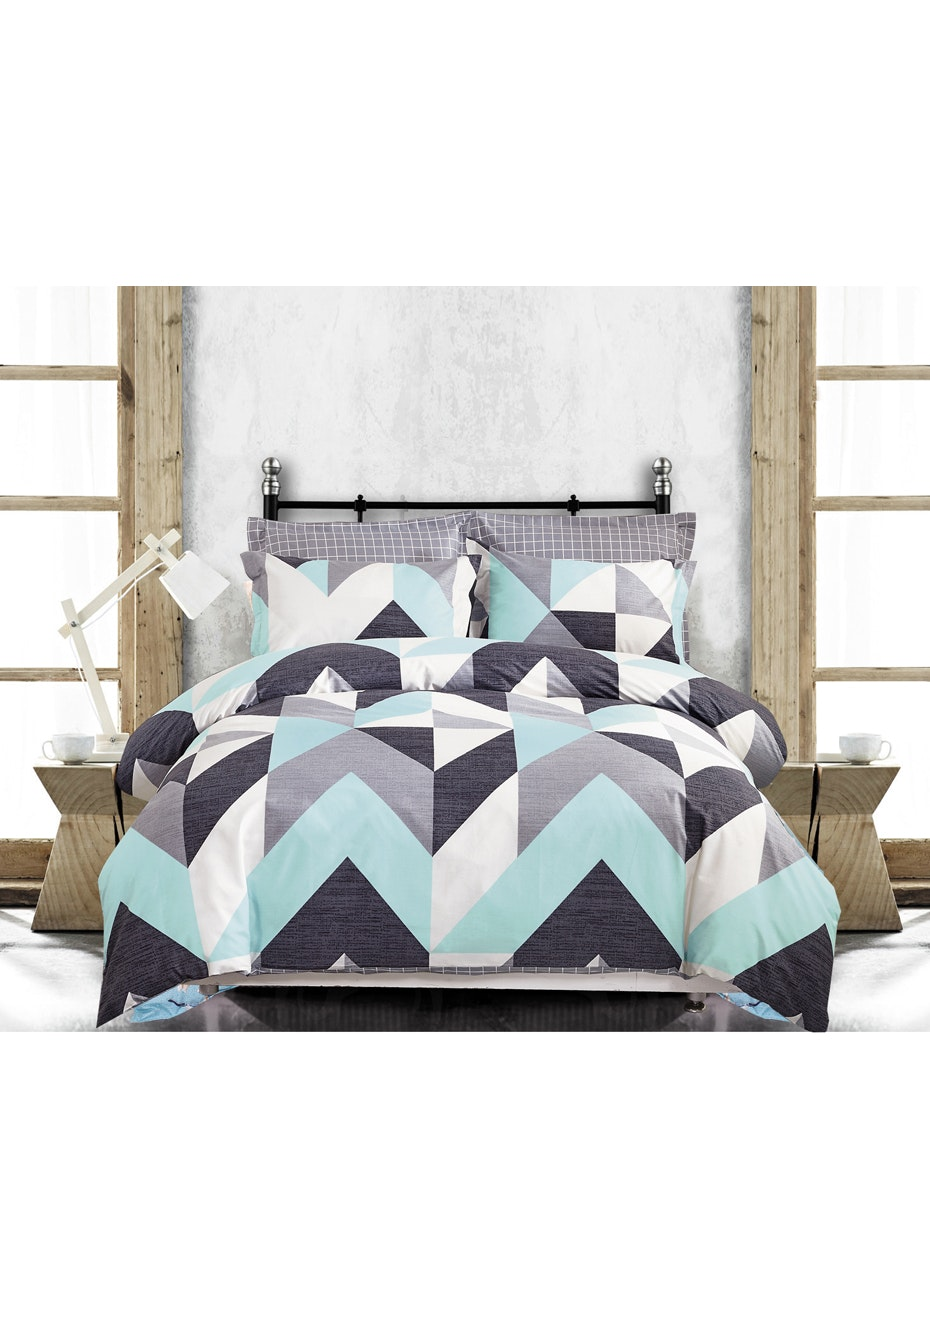 Coastline Quilt Cover Set - Reversible Design - 100% Cotton - Queen Bed